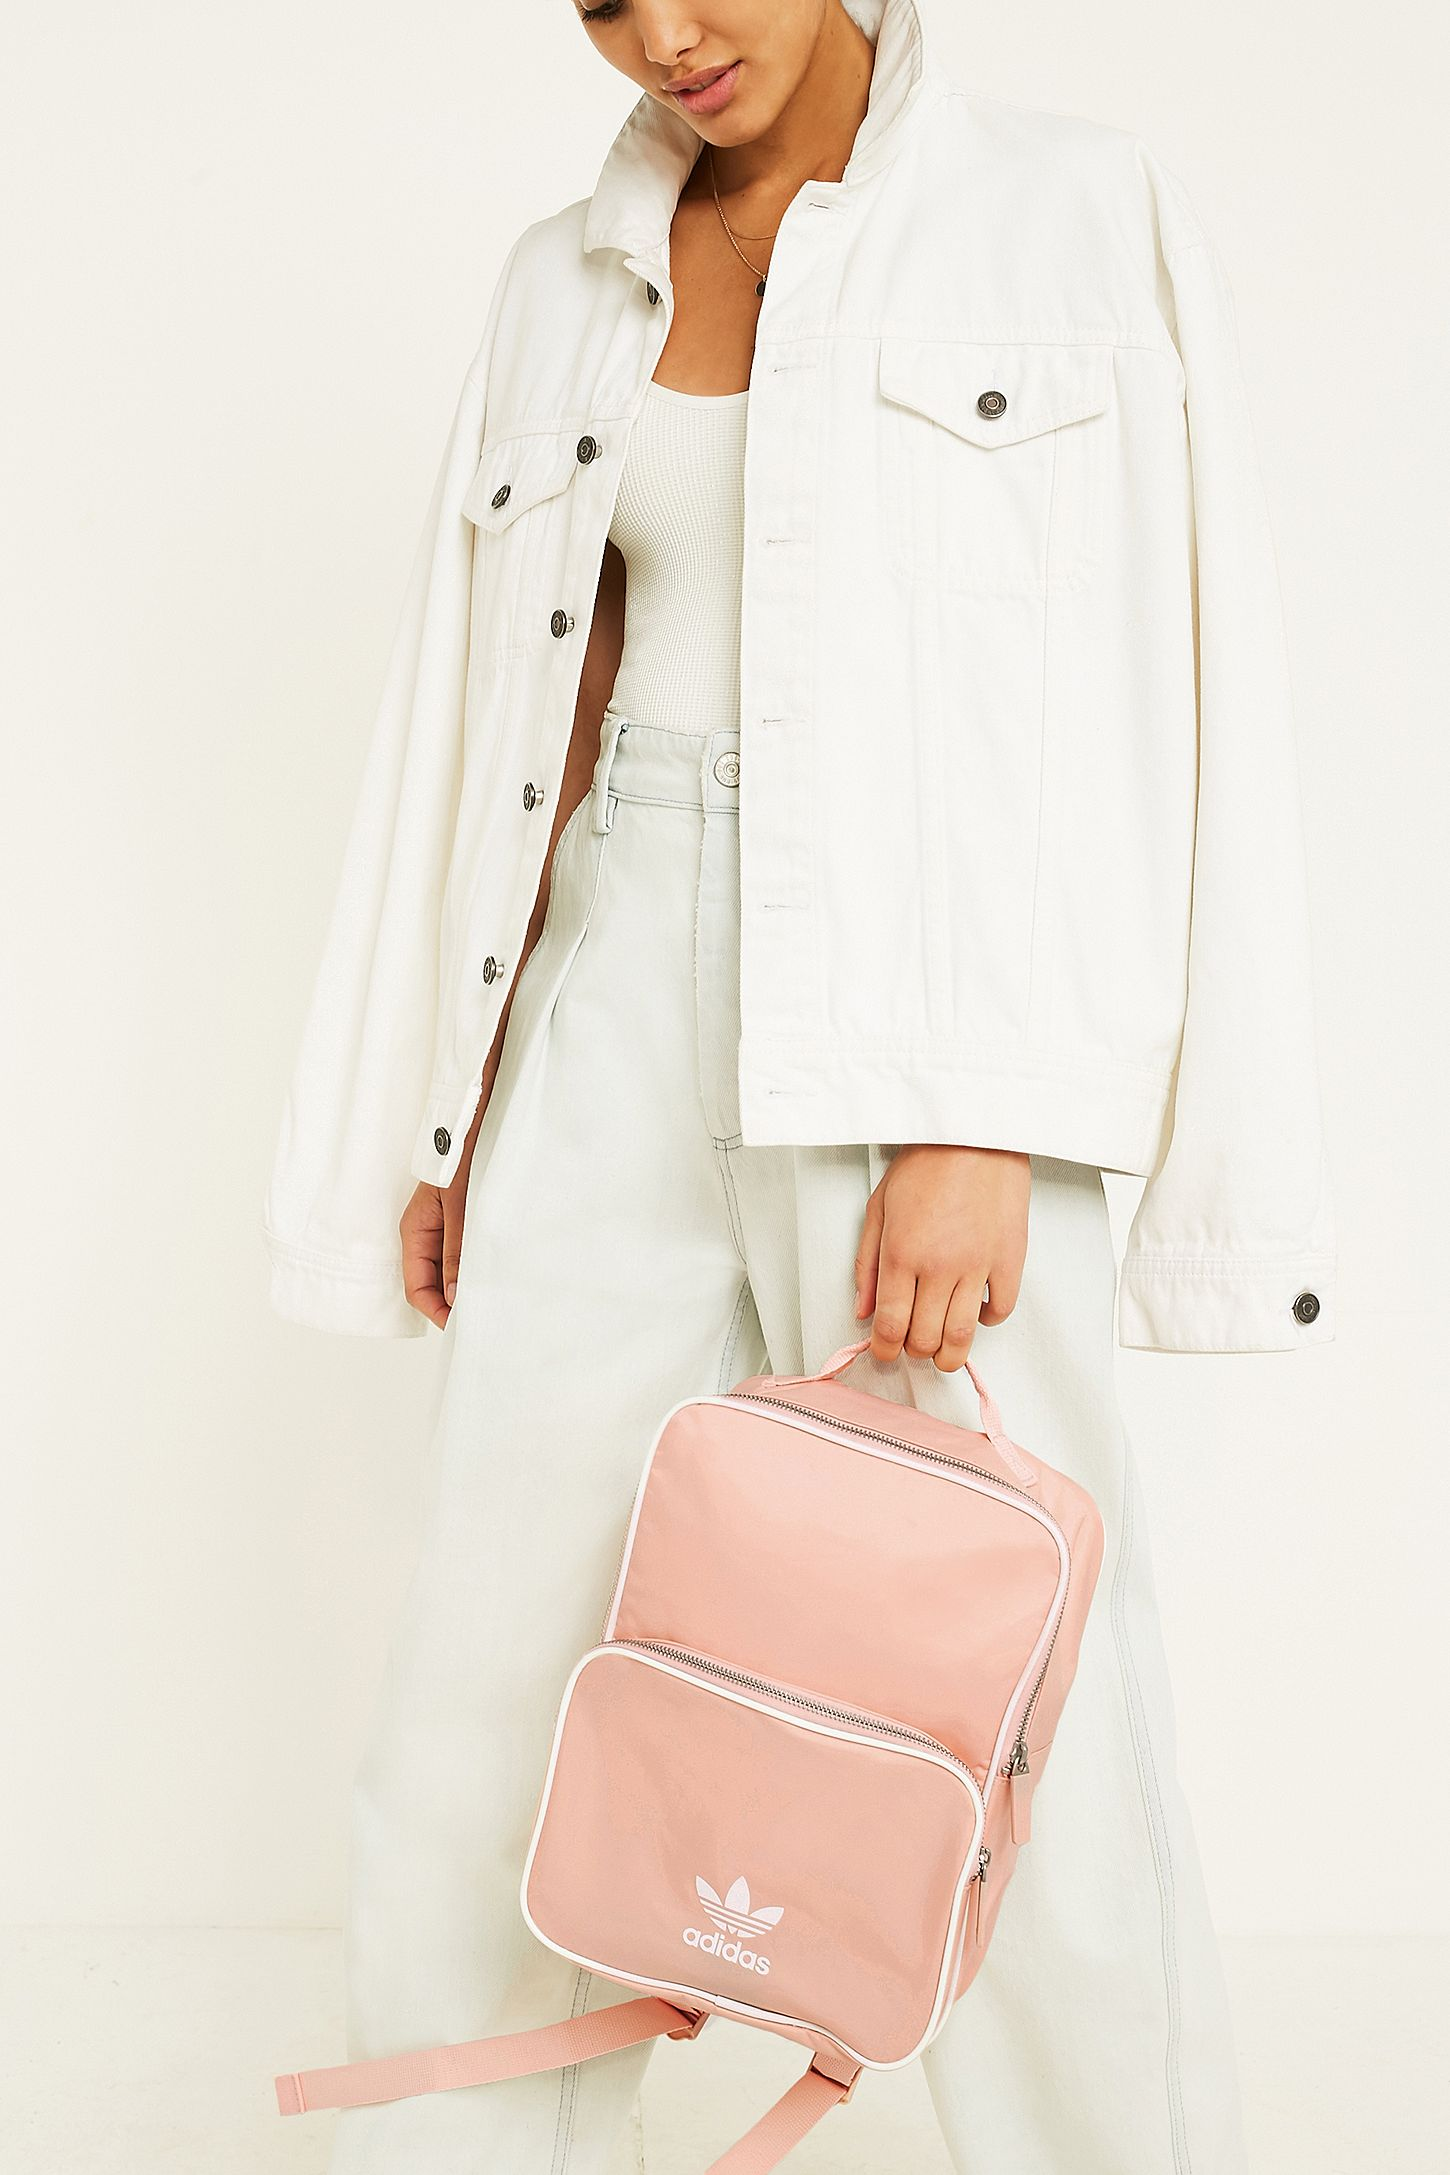 d5373dad744f adidas Originals Adicolor Pink Backpack